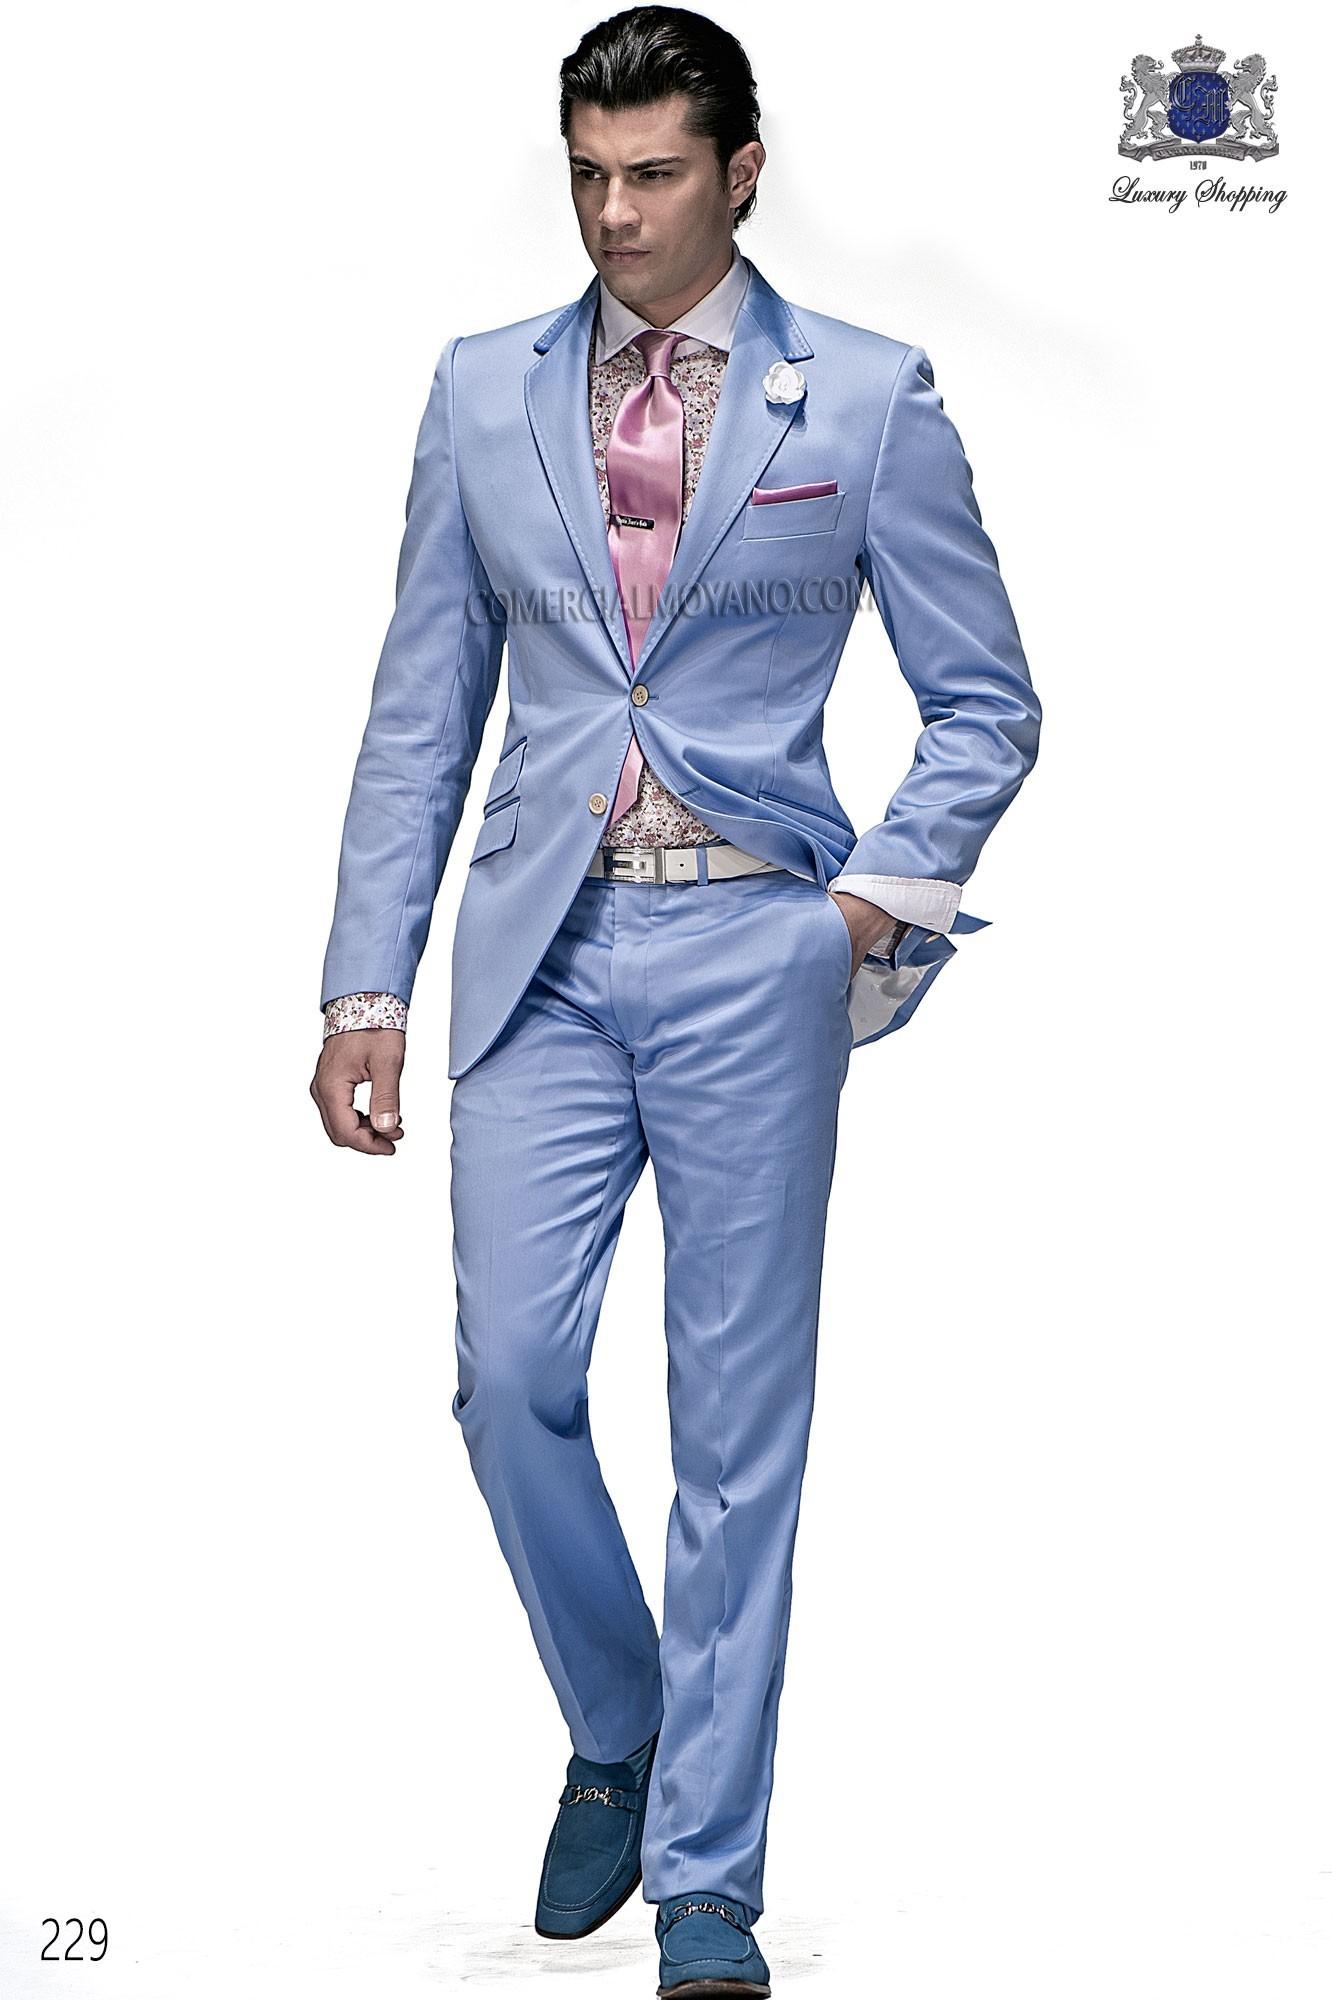 Hipster sky blue men wedding suit model 229 Ottavio Nuccio Gala